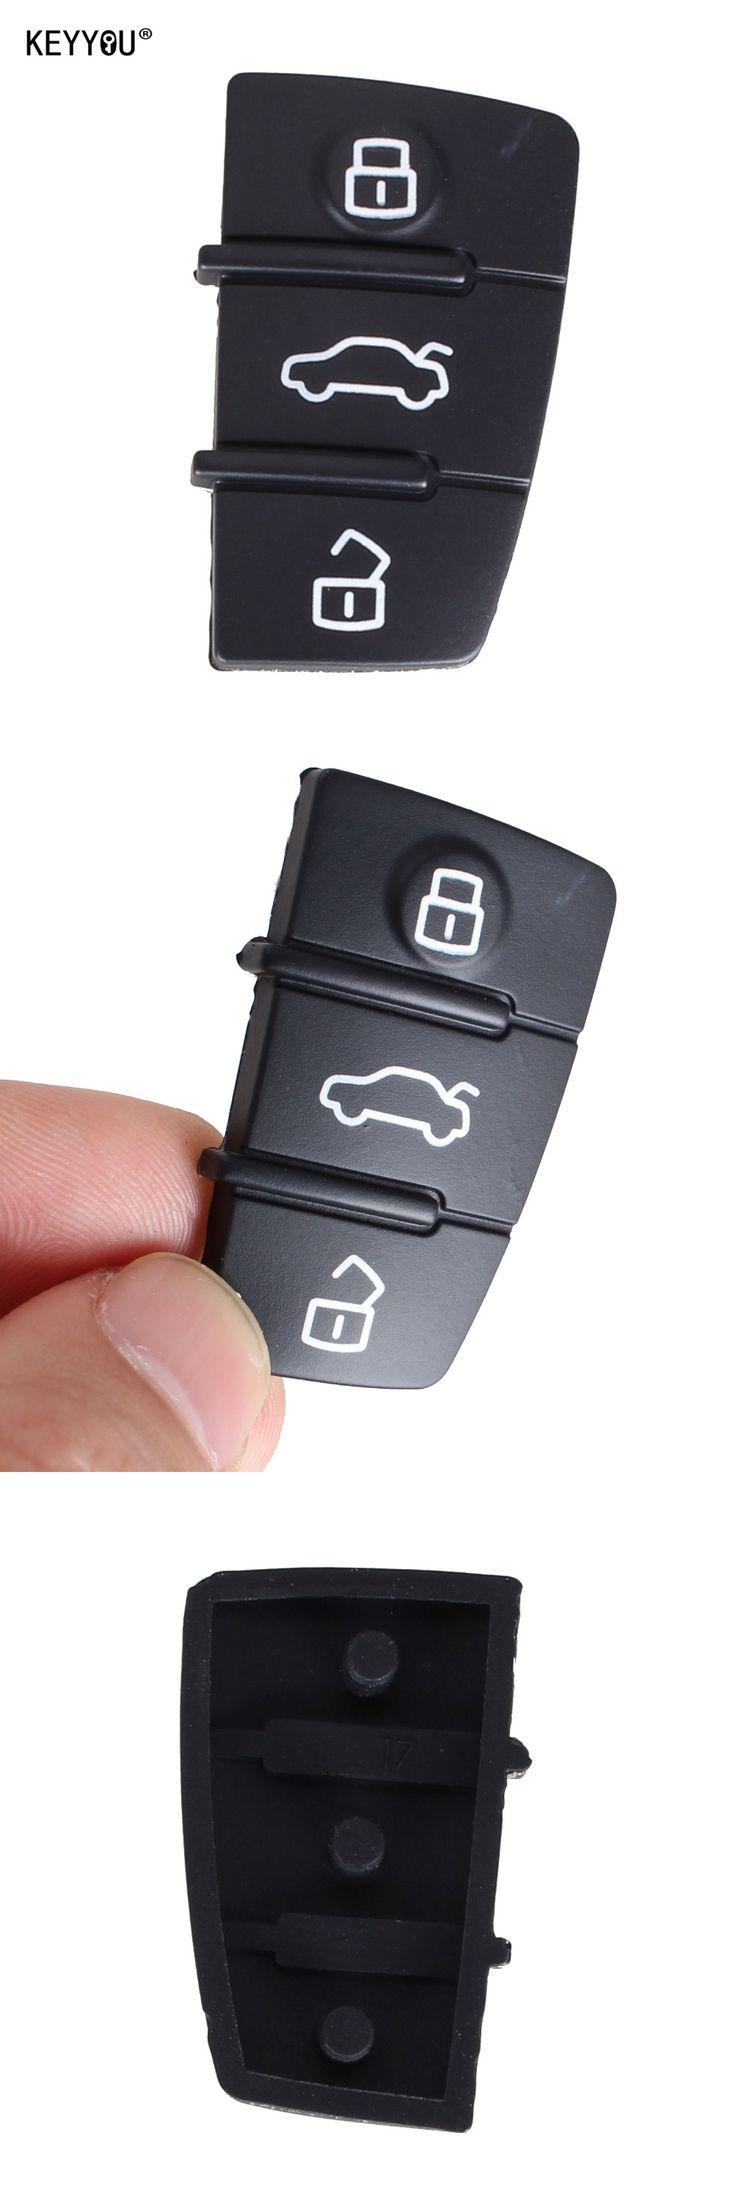 KEYYOU 1Pcs Remote Flip Key Fob 3 Button Pad For AUDI A3,A4,A5,A6,A8,Q5,Q7,TT S LINE RS Car Key Pad Rubber